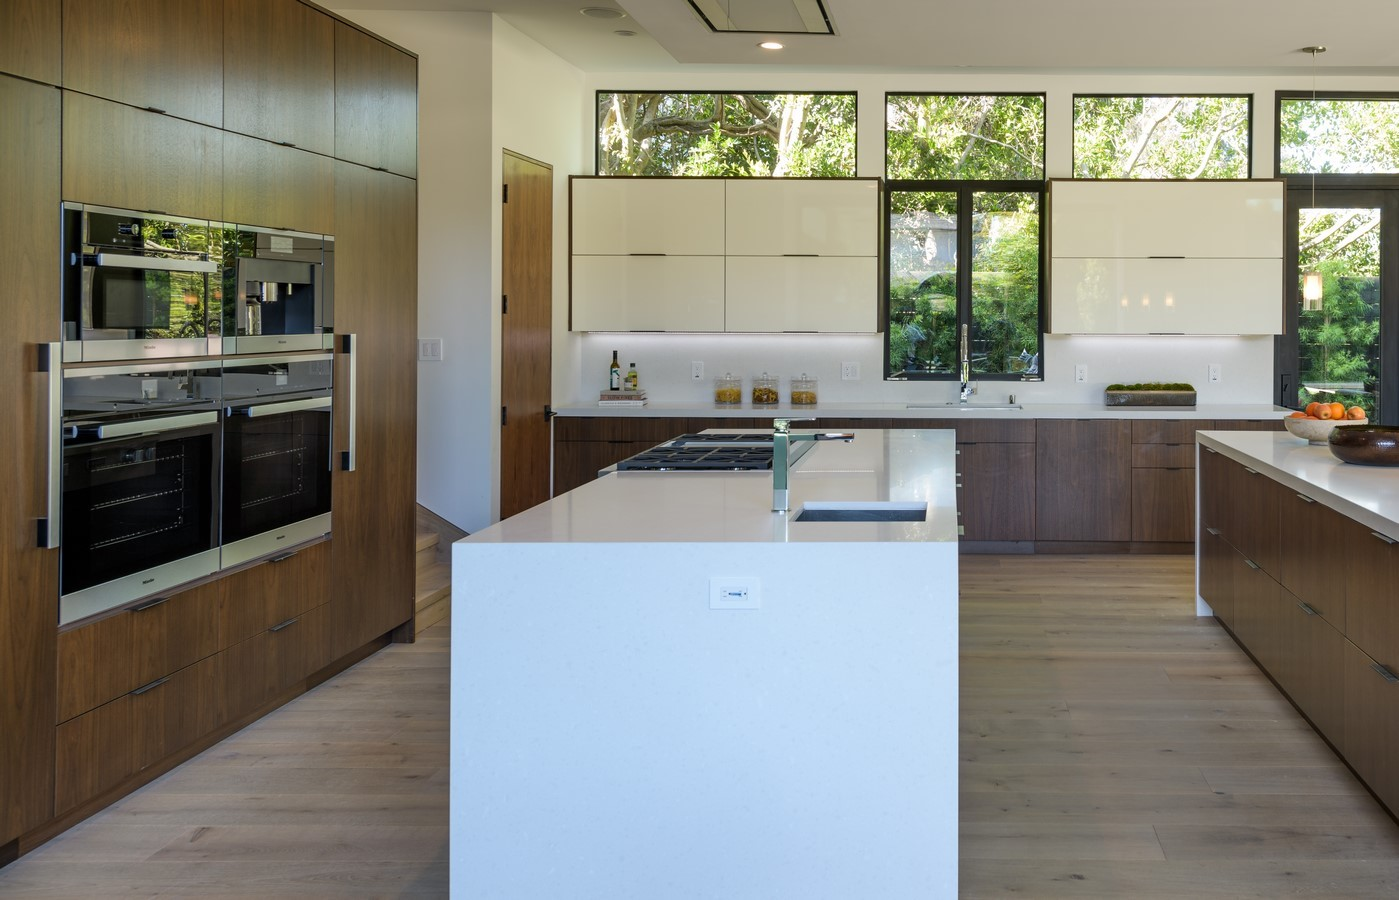 Amalfi Drive Residen By Michael Lee Architects - Sheet3